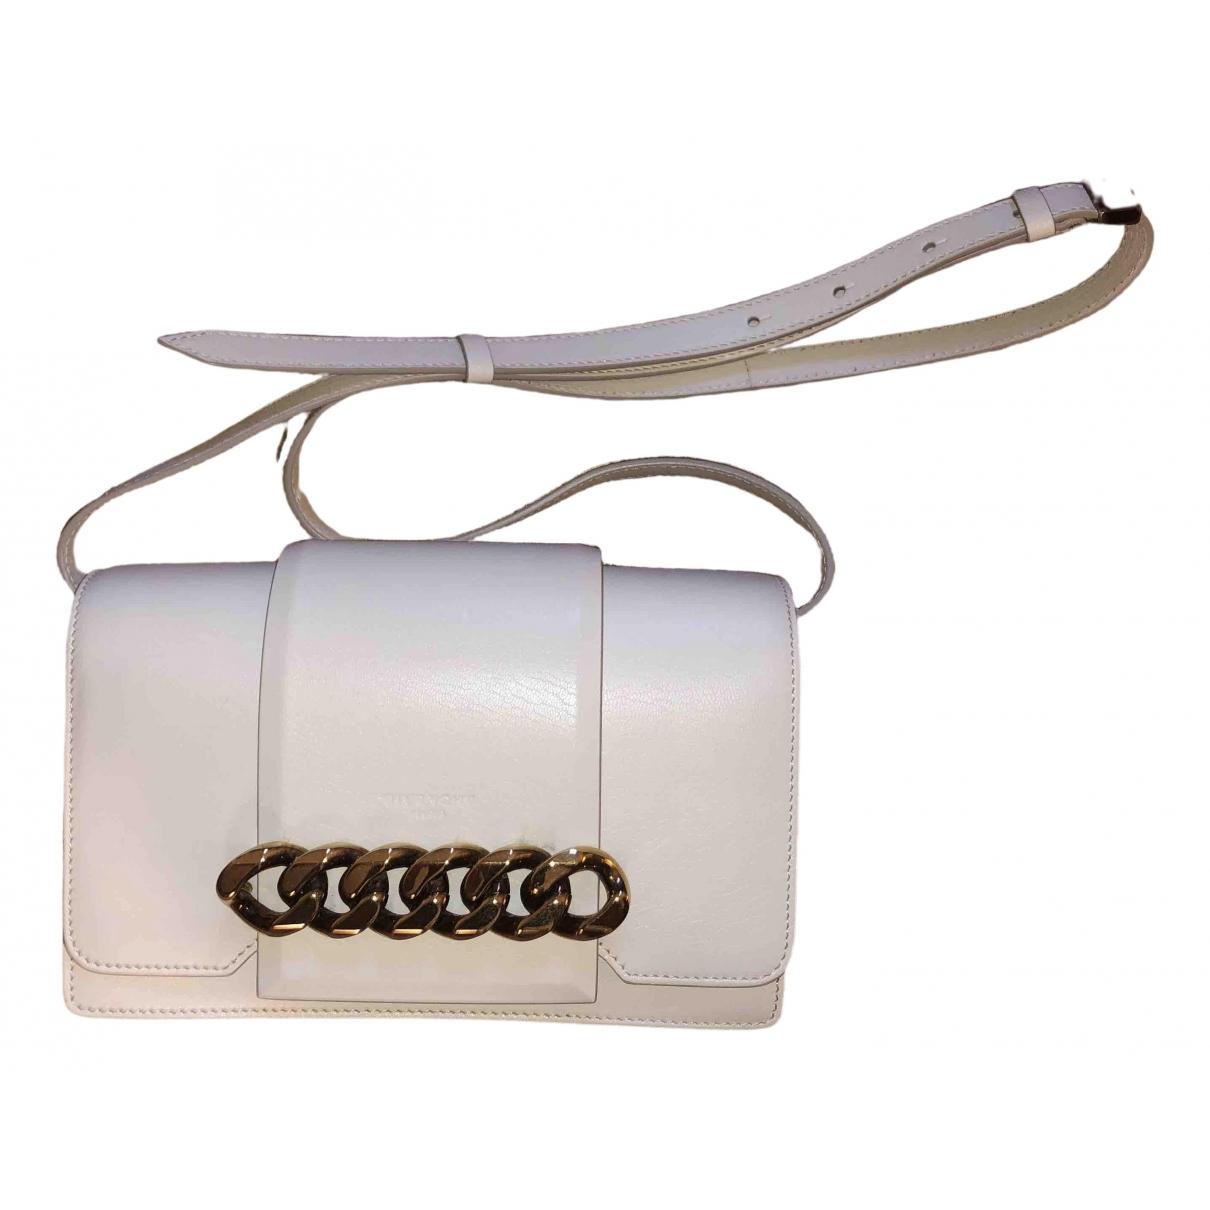 Givenchy Infinity Handtasche in  Ecru Leder